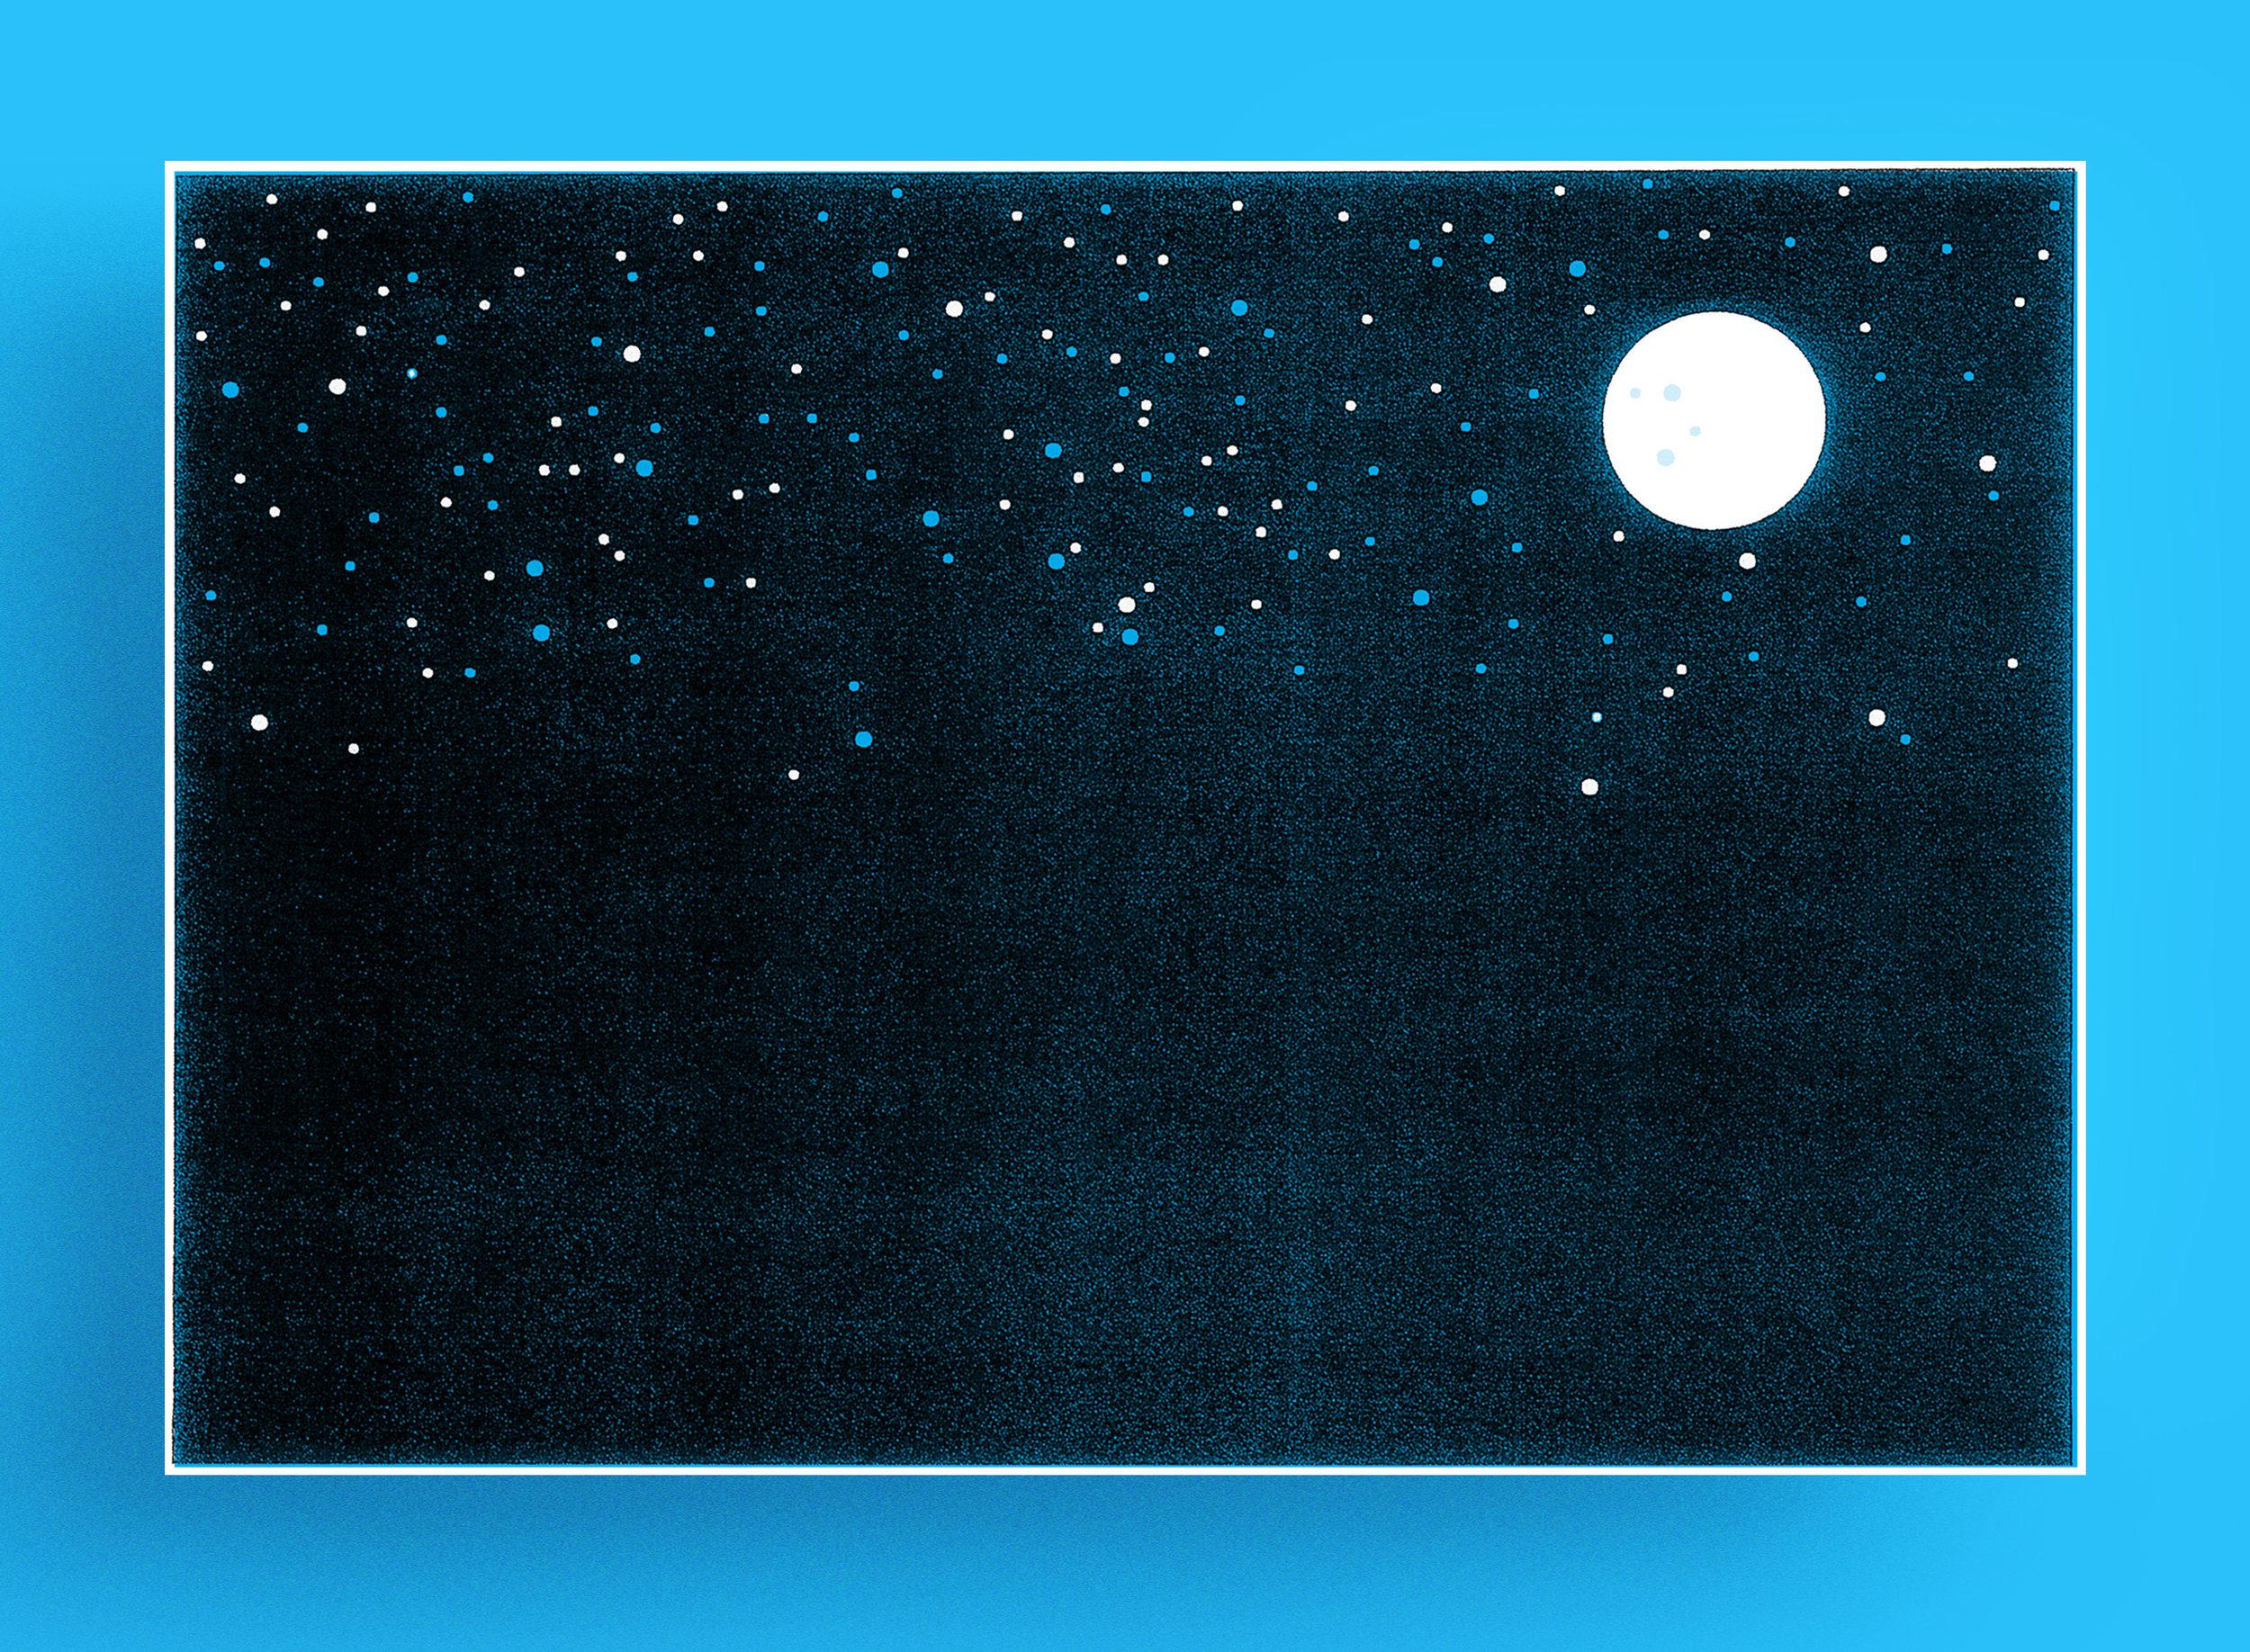 HSITI_Starry_Night.jpg